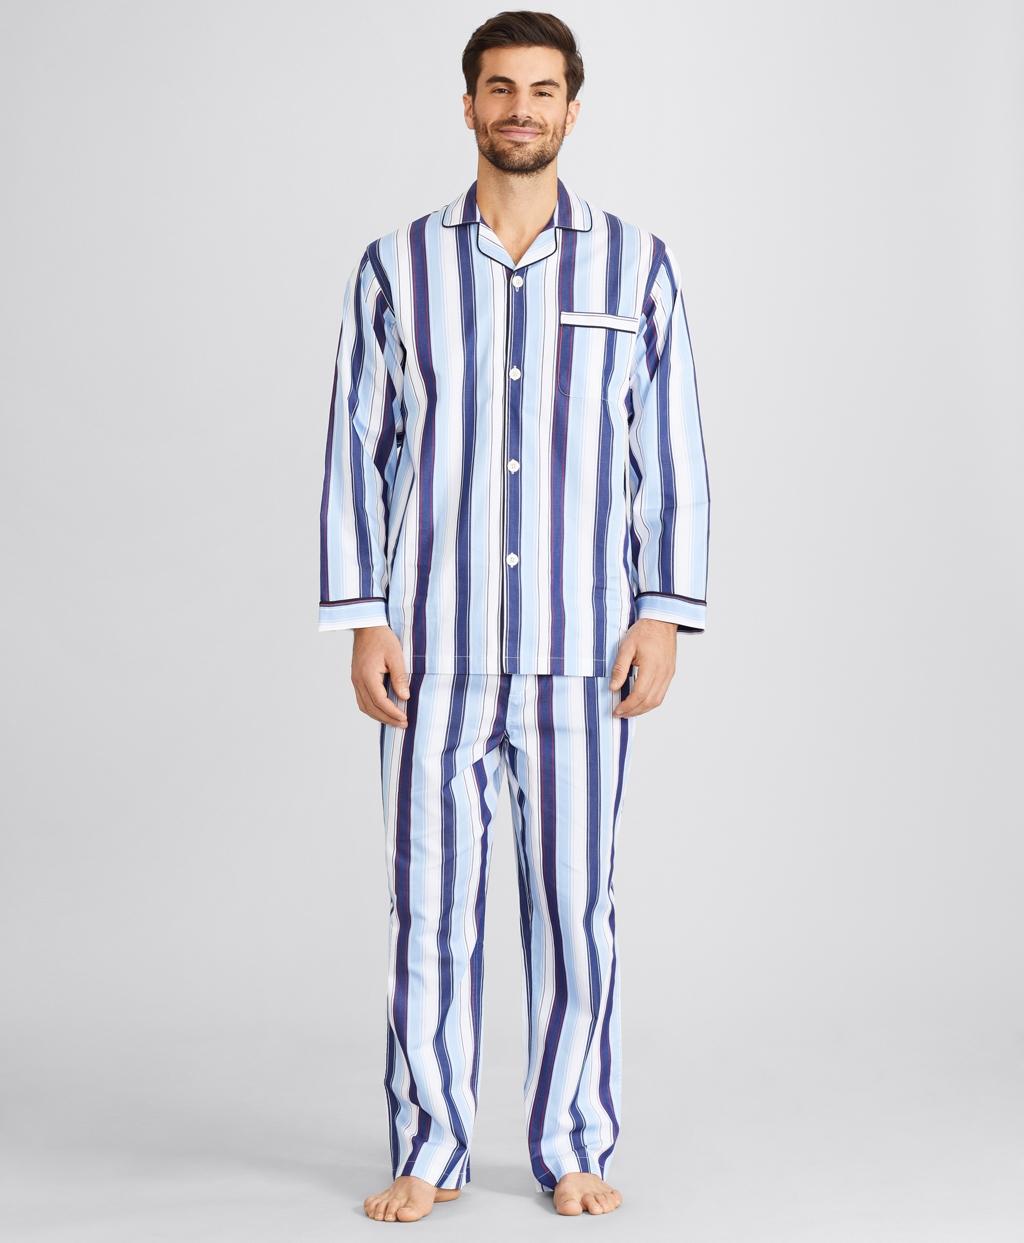 1940s Men's Underwear: Briefs, Boxers, Unions, & Socks Brooks Brothers Mens Bold Stripe Pajamas $98.50 AT vintagedancer.com